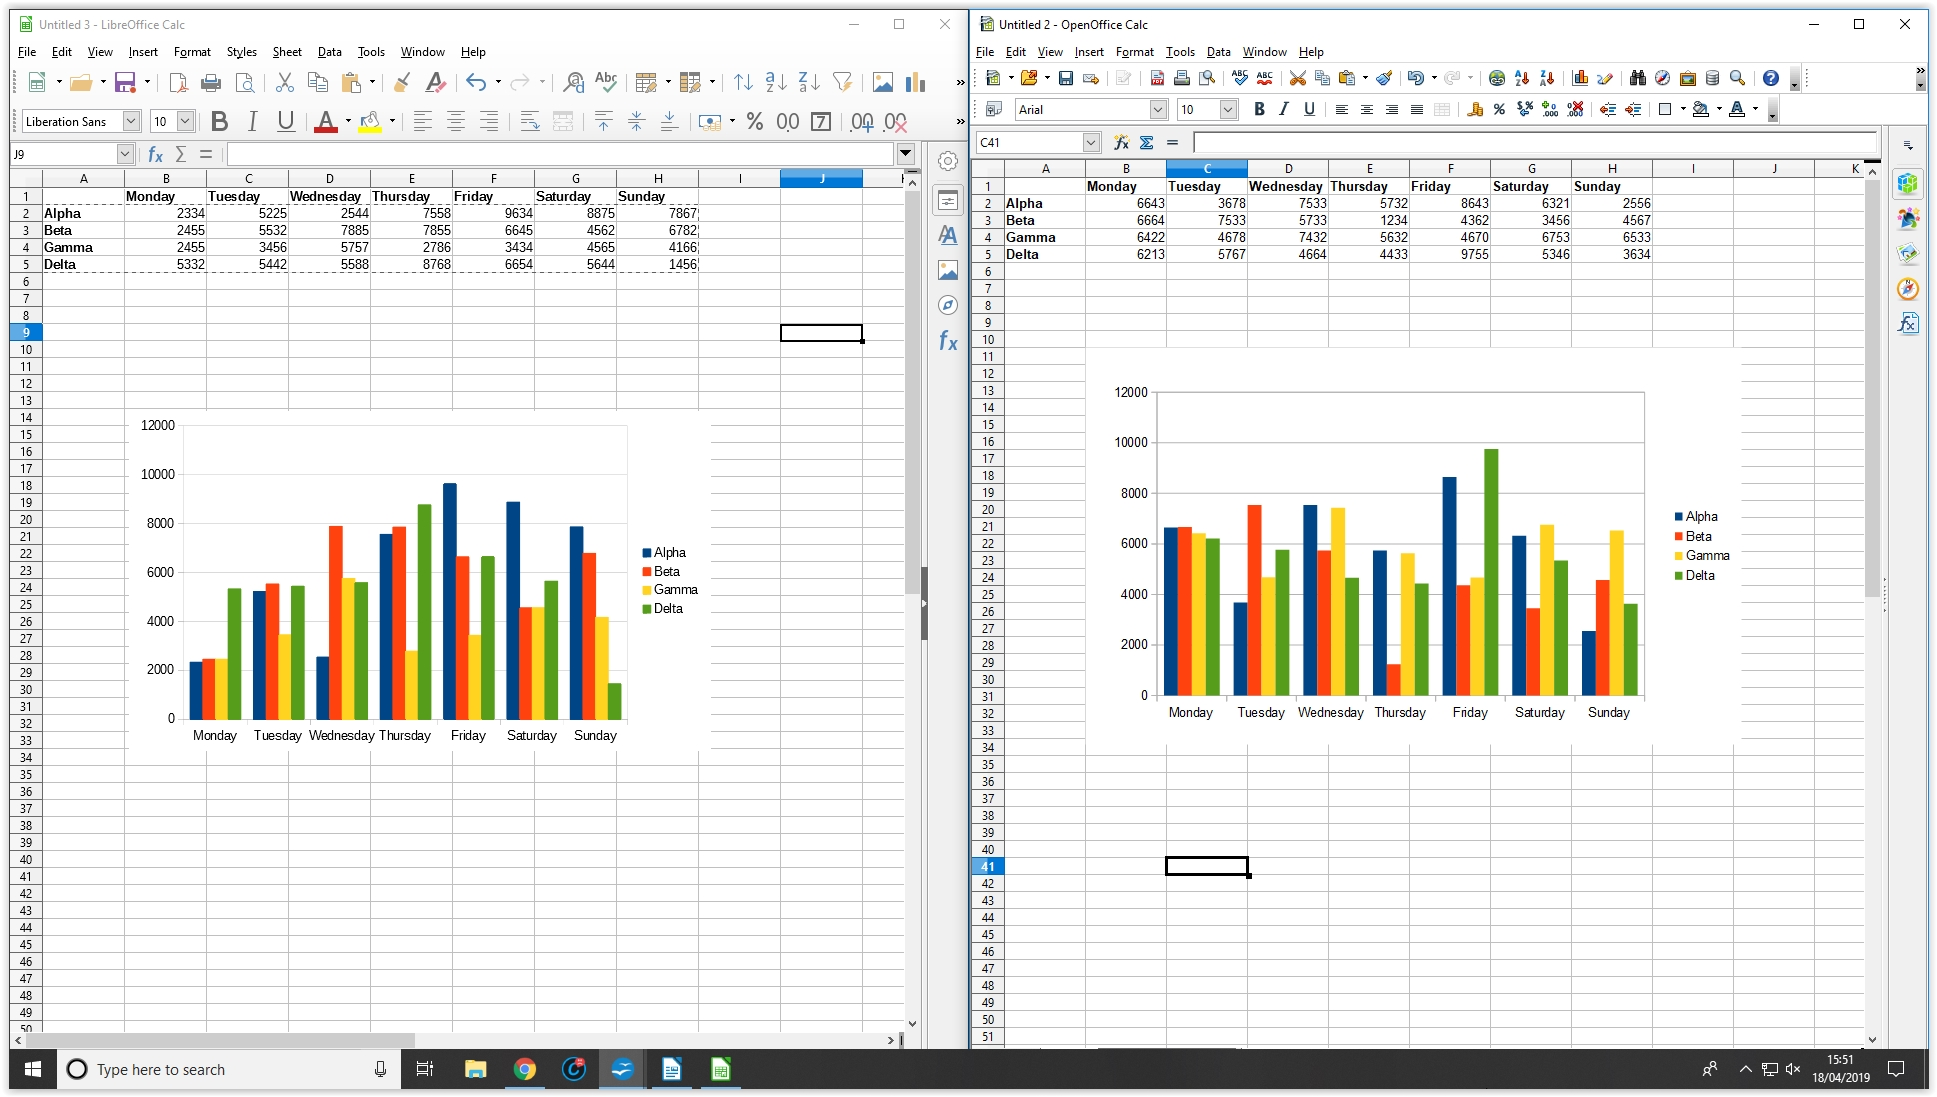 LibreOffice Calc und Apache OpenOffice